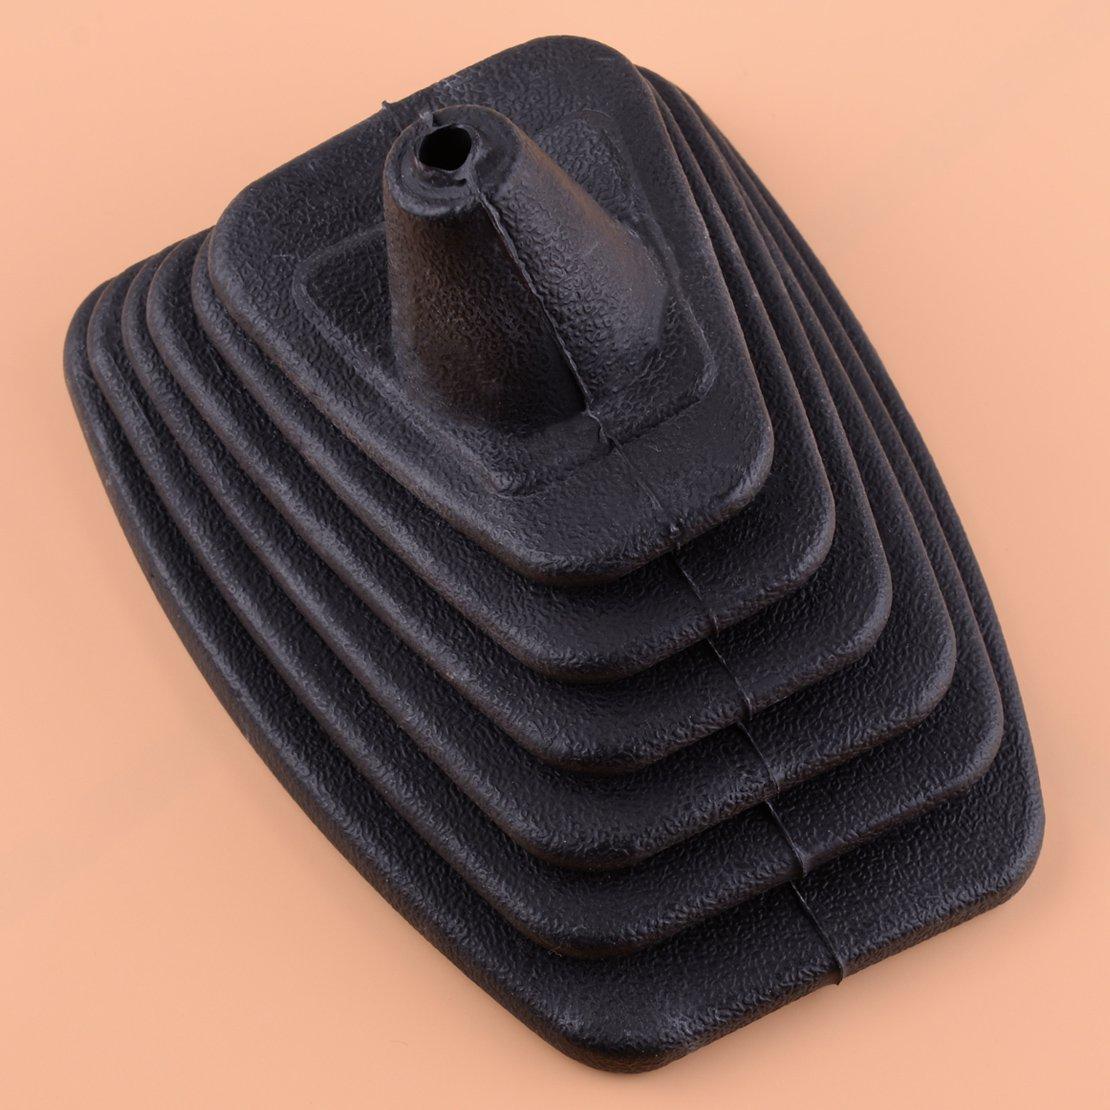 Daphot-Store - New Rubber Black Gear Shift Gaiter Boot Cover Fit For VW Golf MK2 II Jetta II MK2